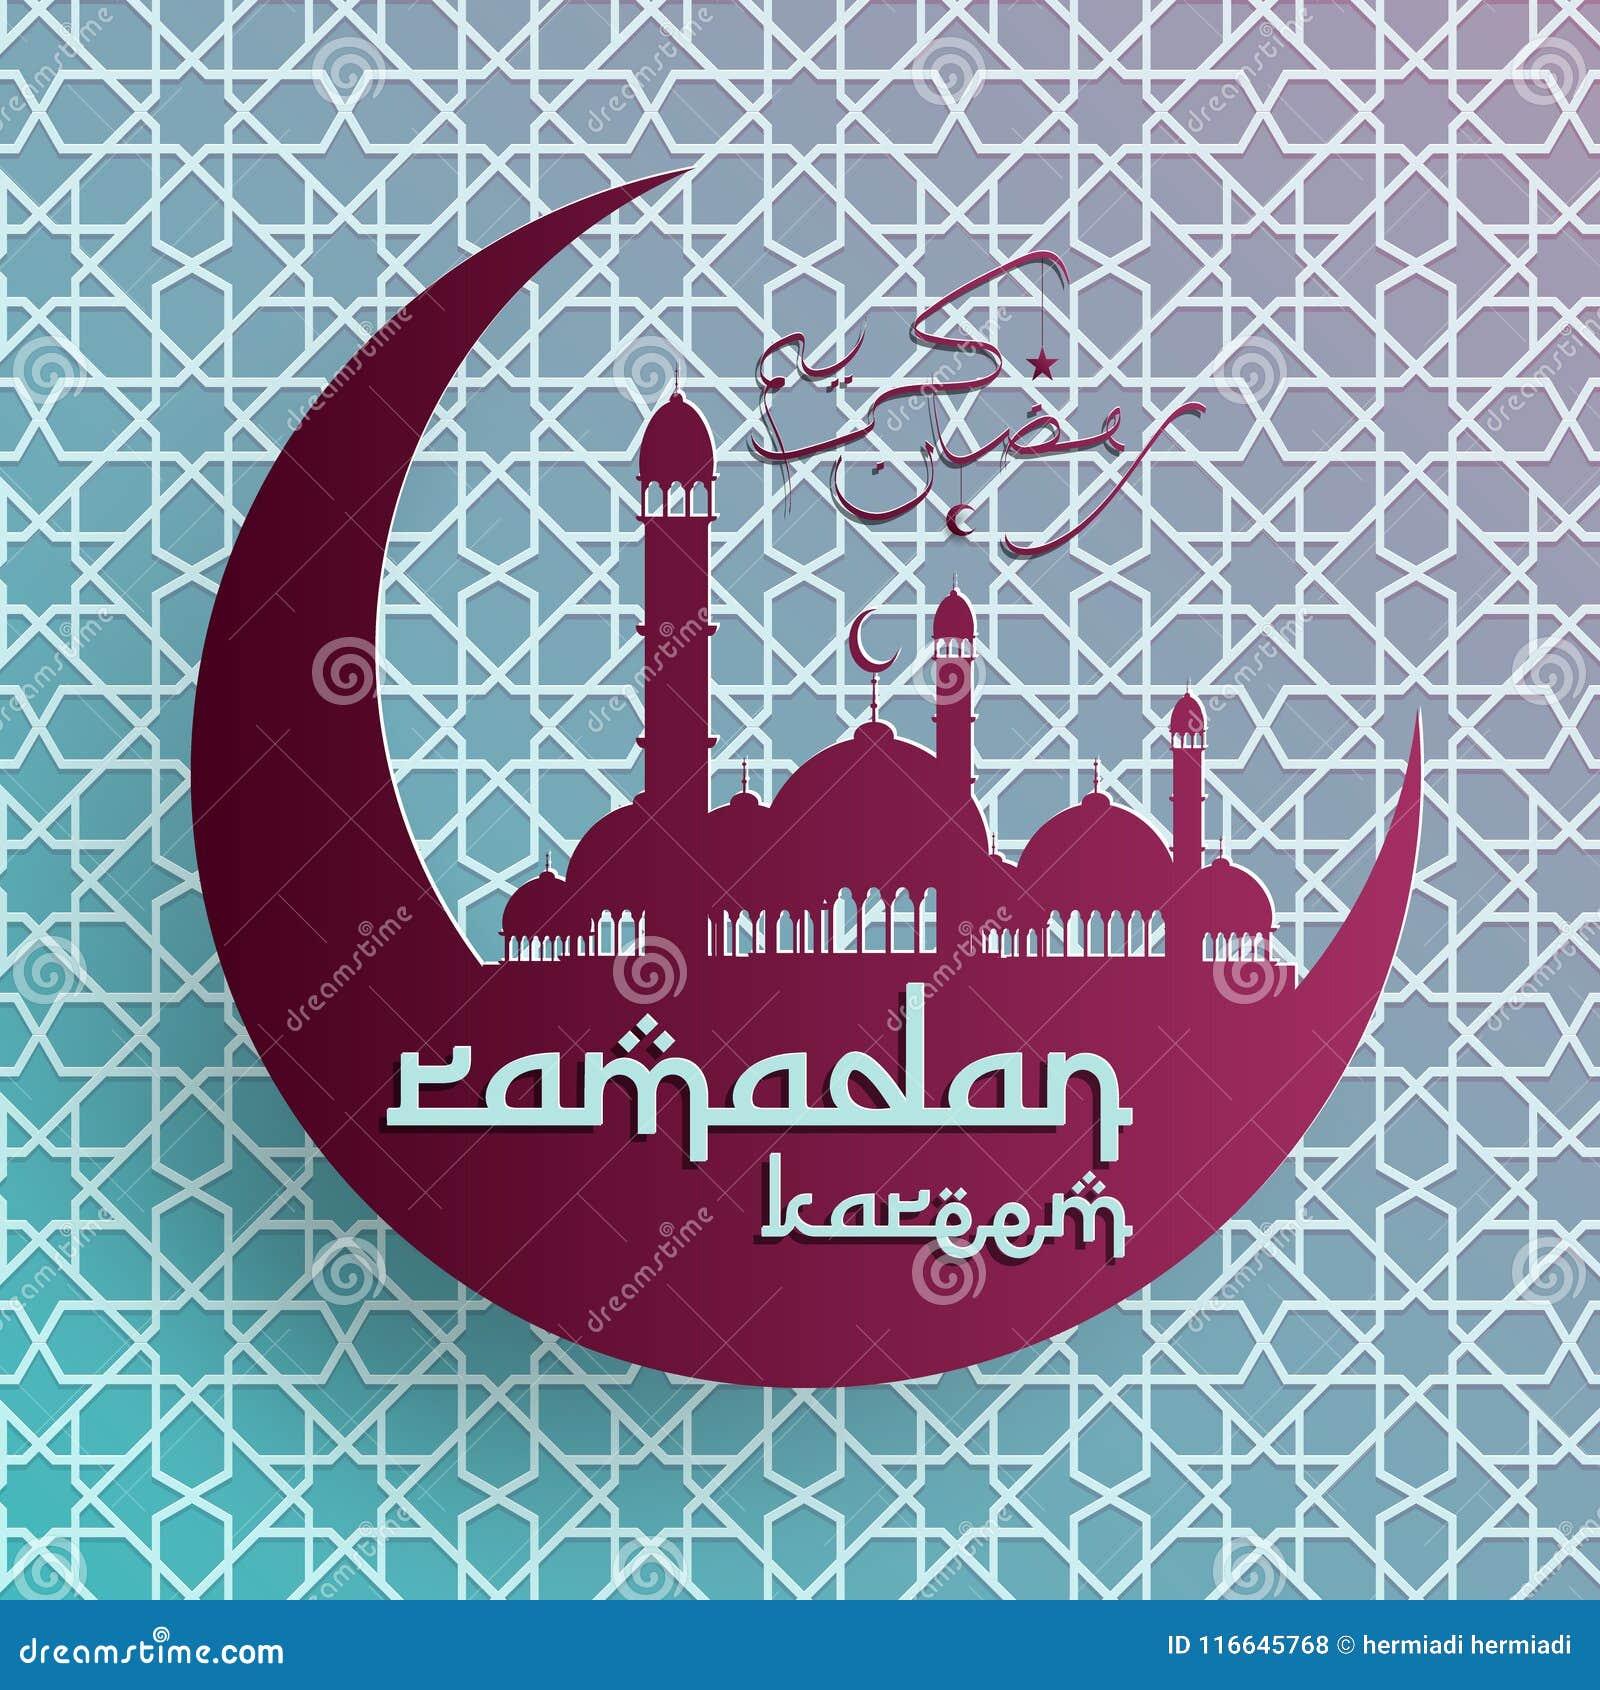 Ramadan Kareem Background, Ramadan Mubarak Background, fondo islamico